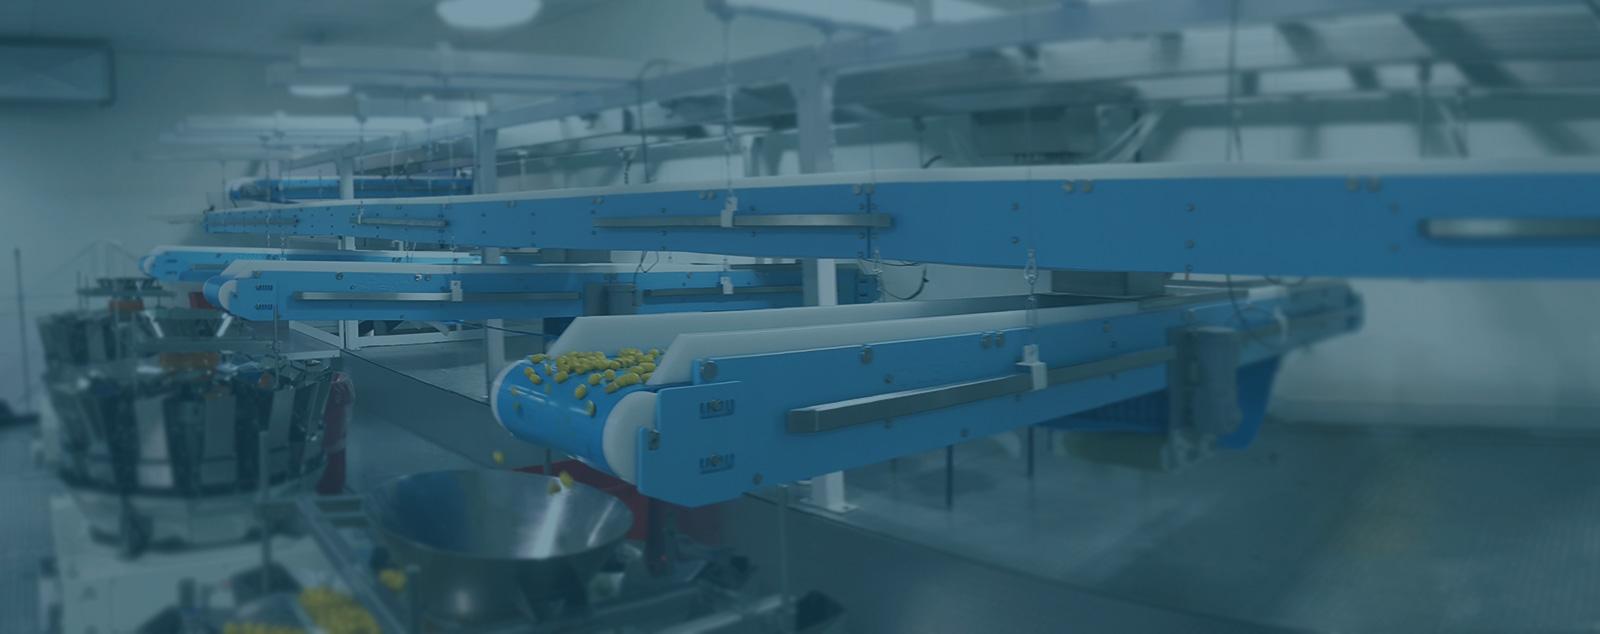 DynaClean food conveyor systems.